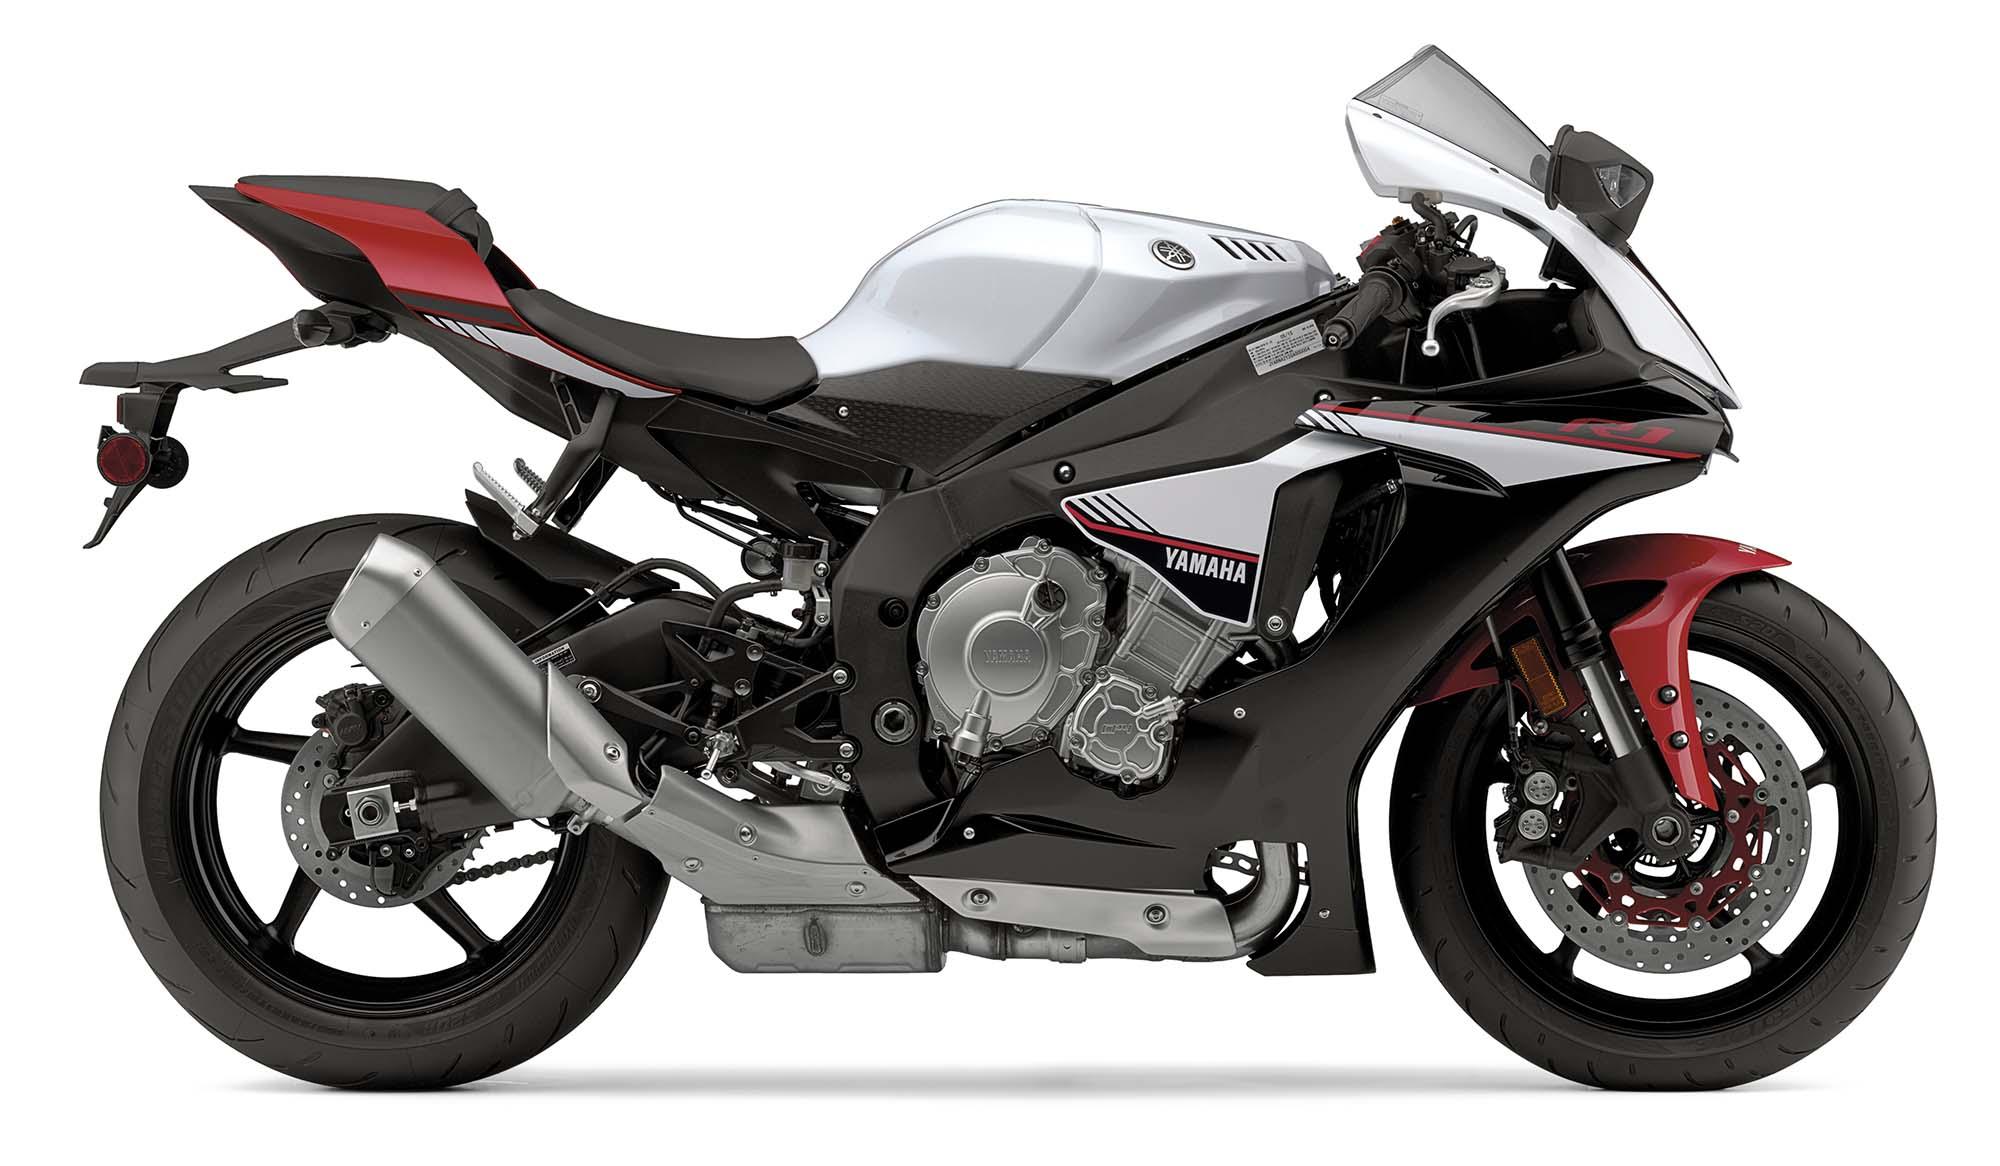 Yamaha Venture Motorcycle Fairings